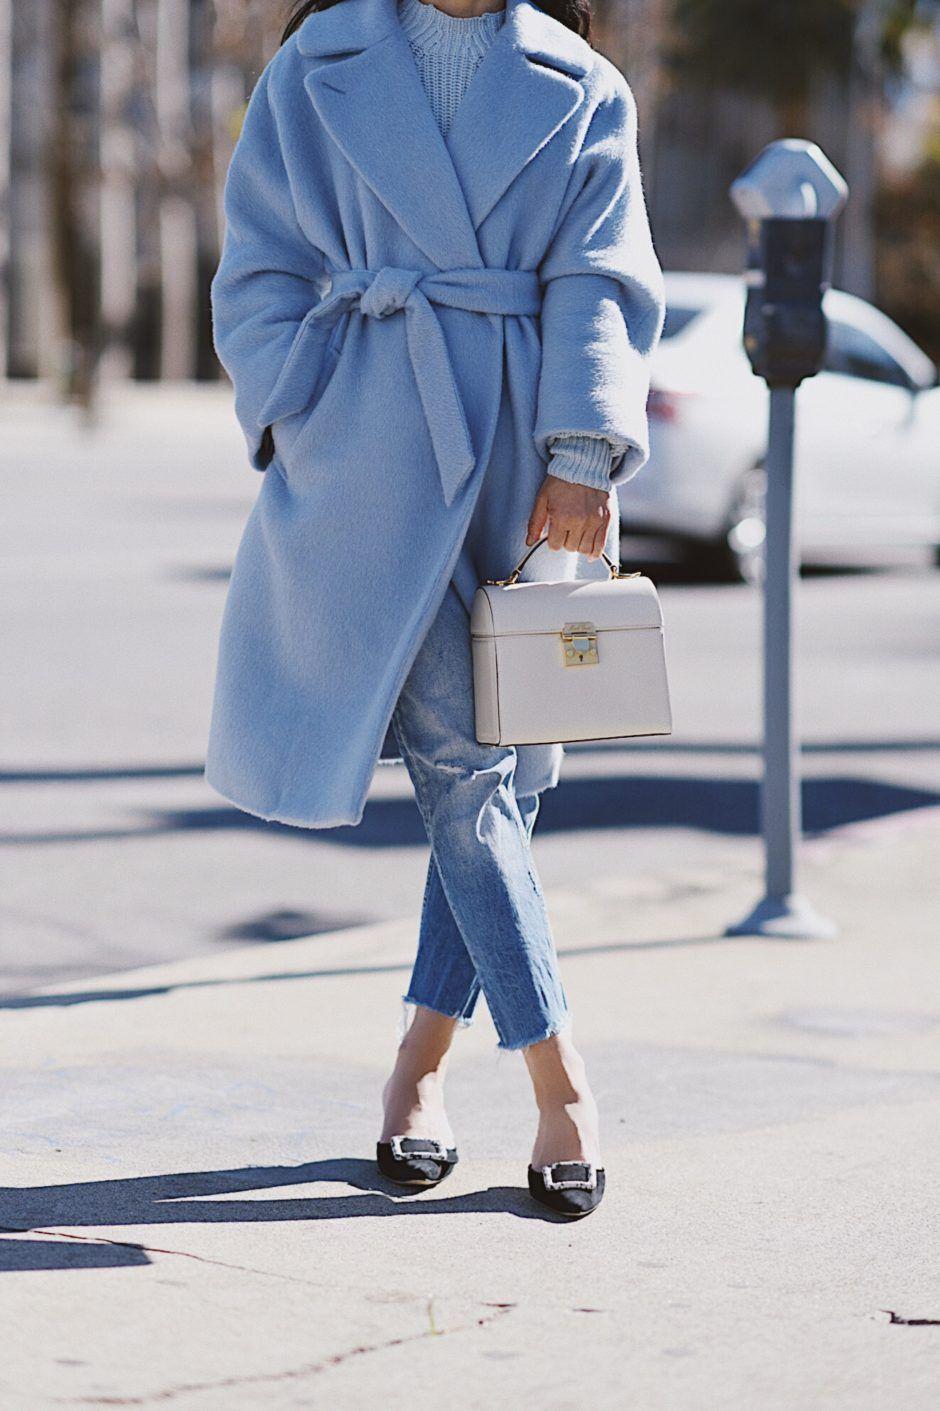 Blue Max Mara Weekend Coat Mark Cross Bag Manolo Blahnikhq Mules Via Halliedaily Blue Coat Outfit Fall Fashion Coats Blue Coats